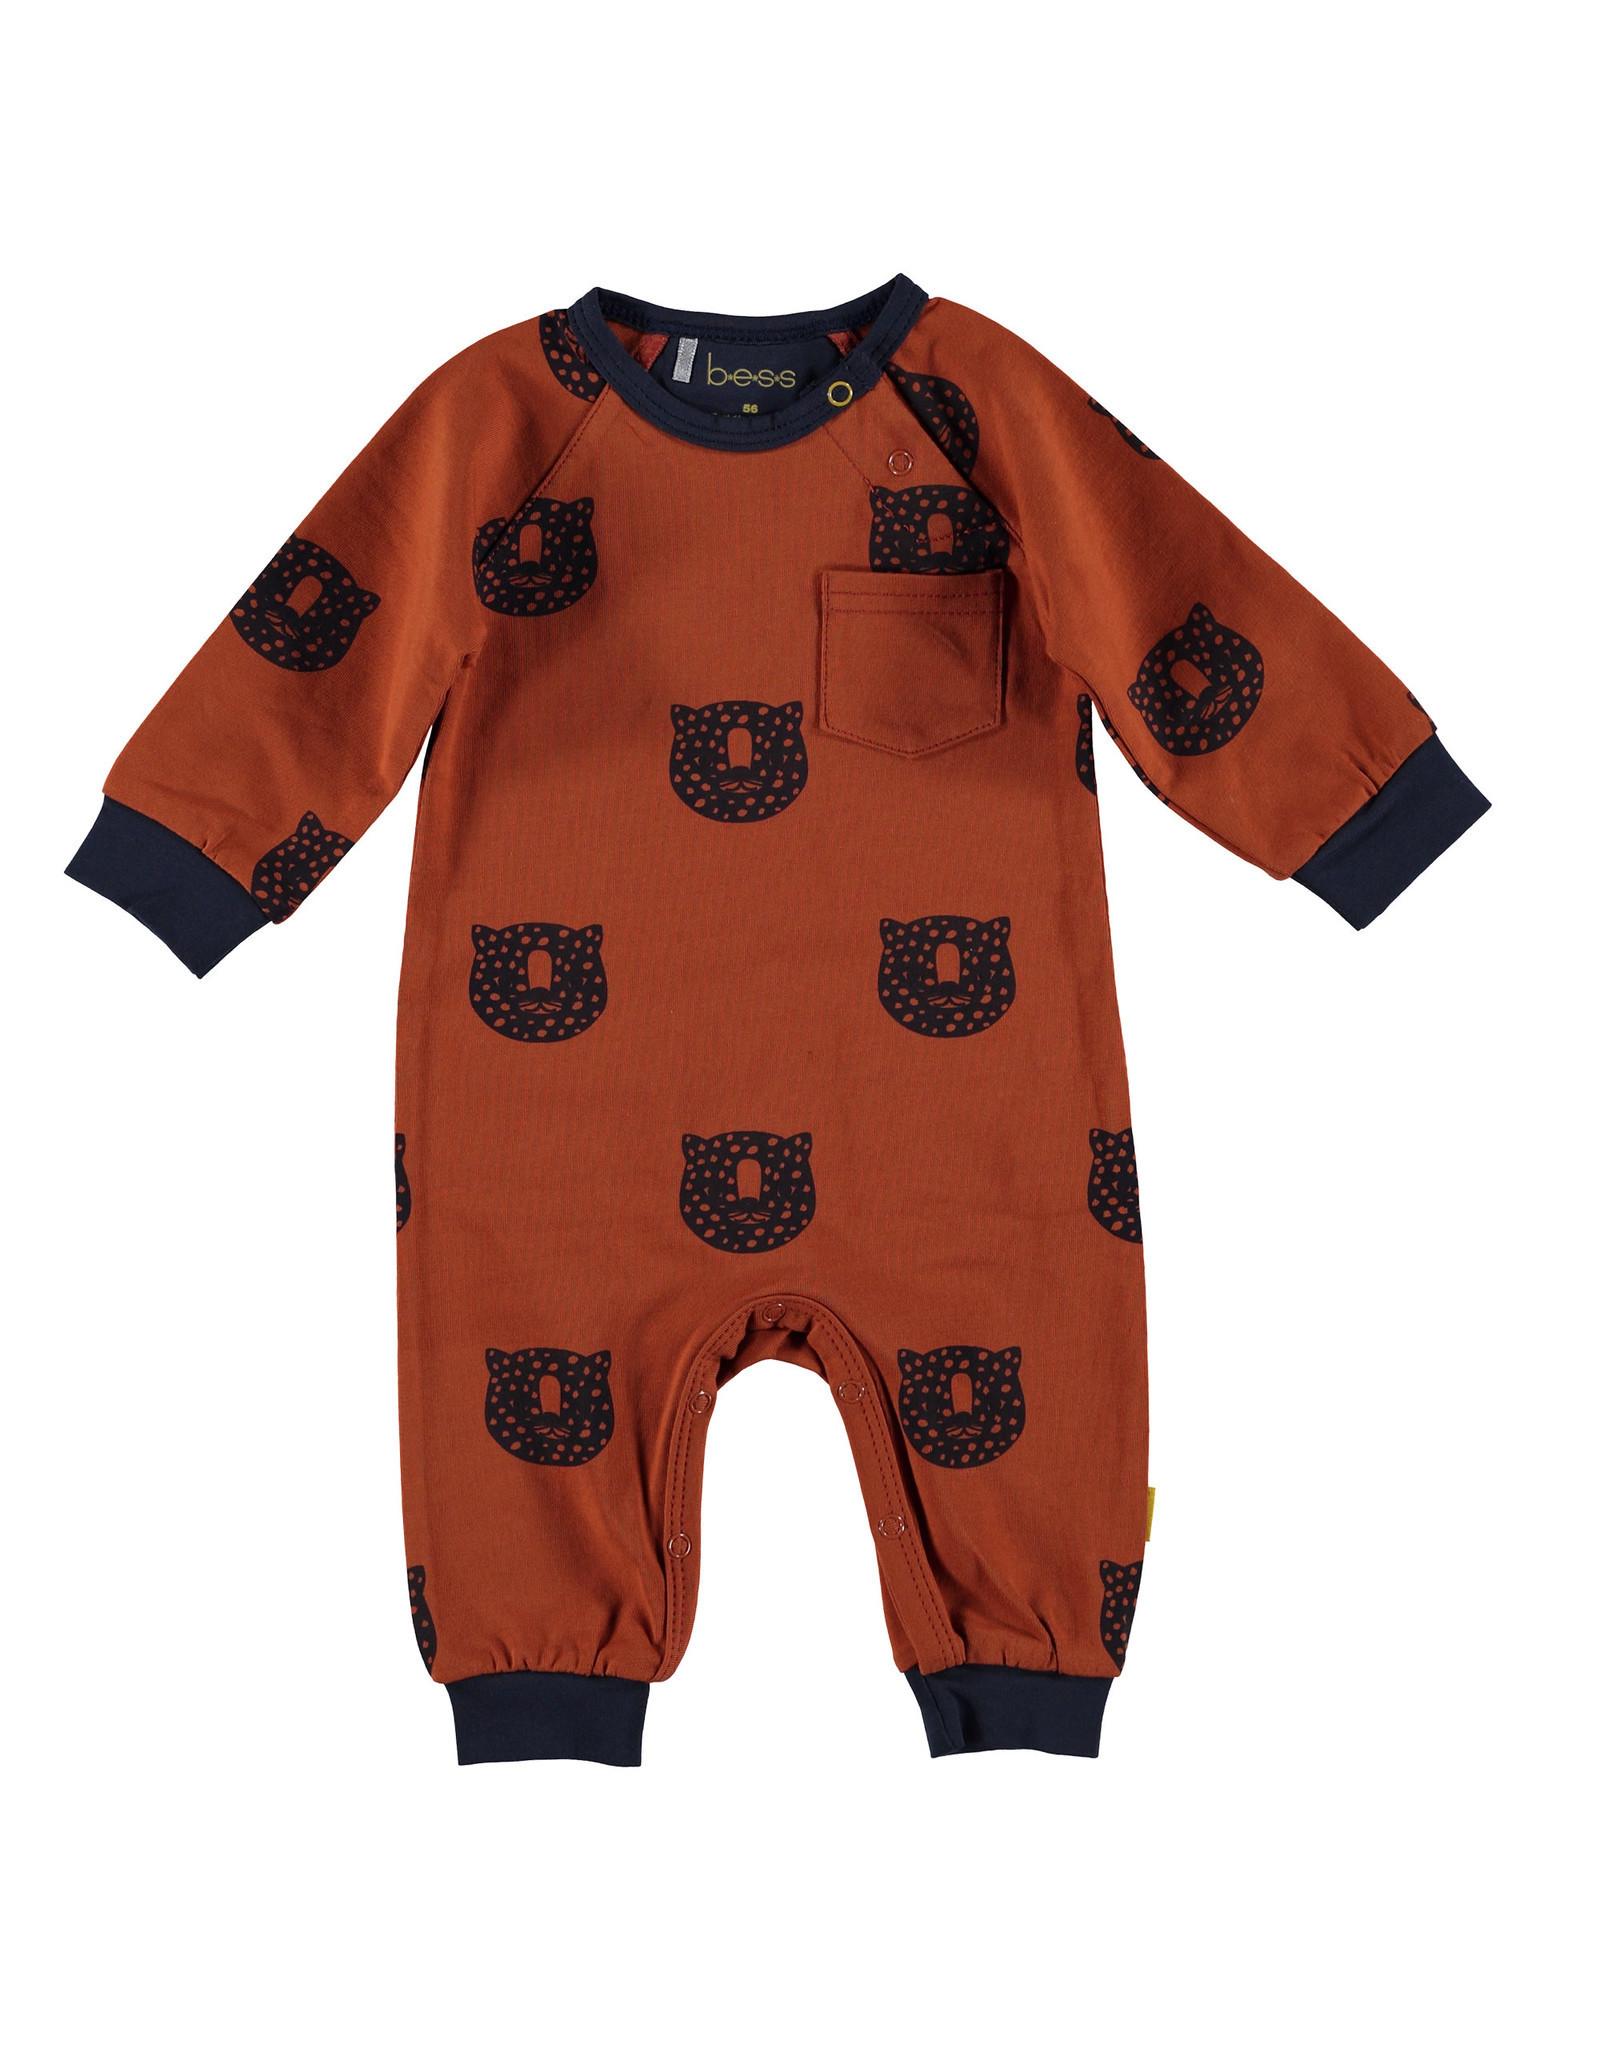 BESS BESS Suit AOP Tiger Rusty